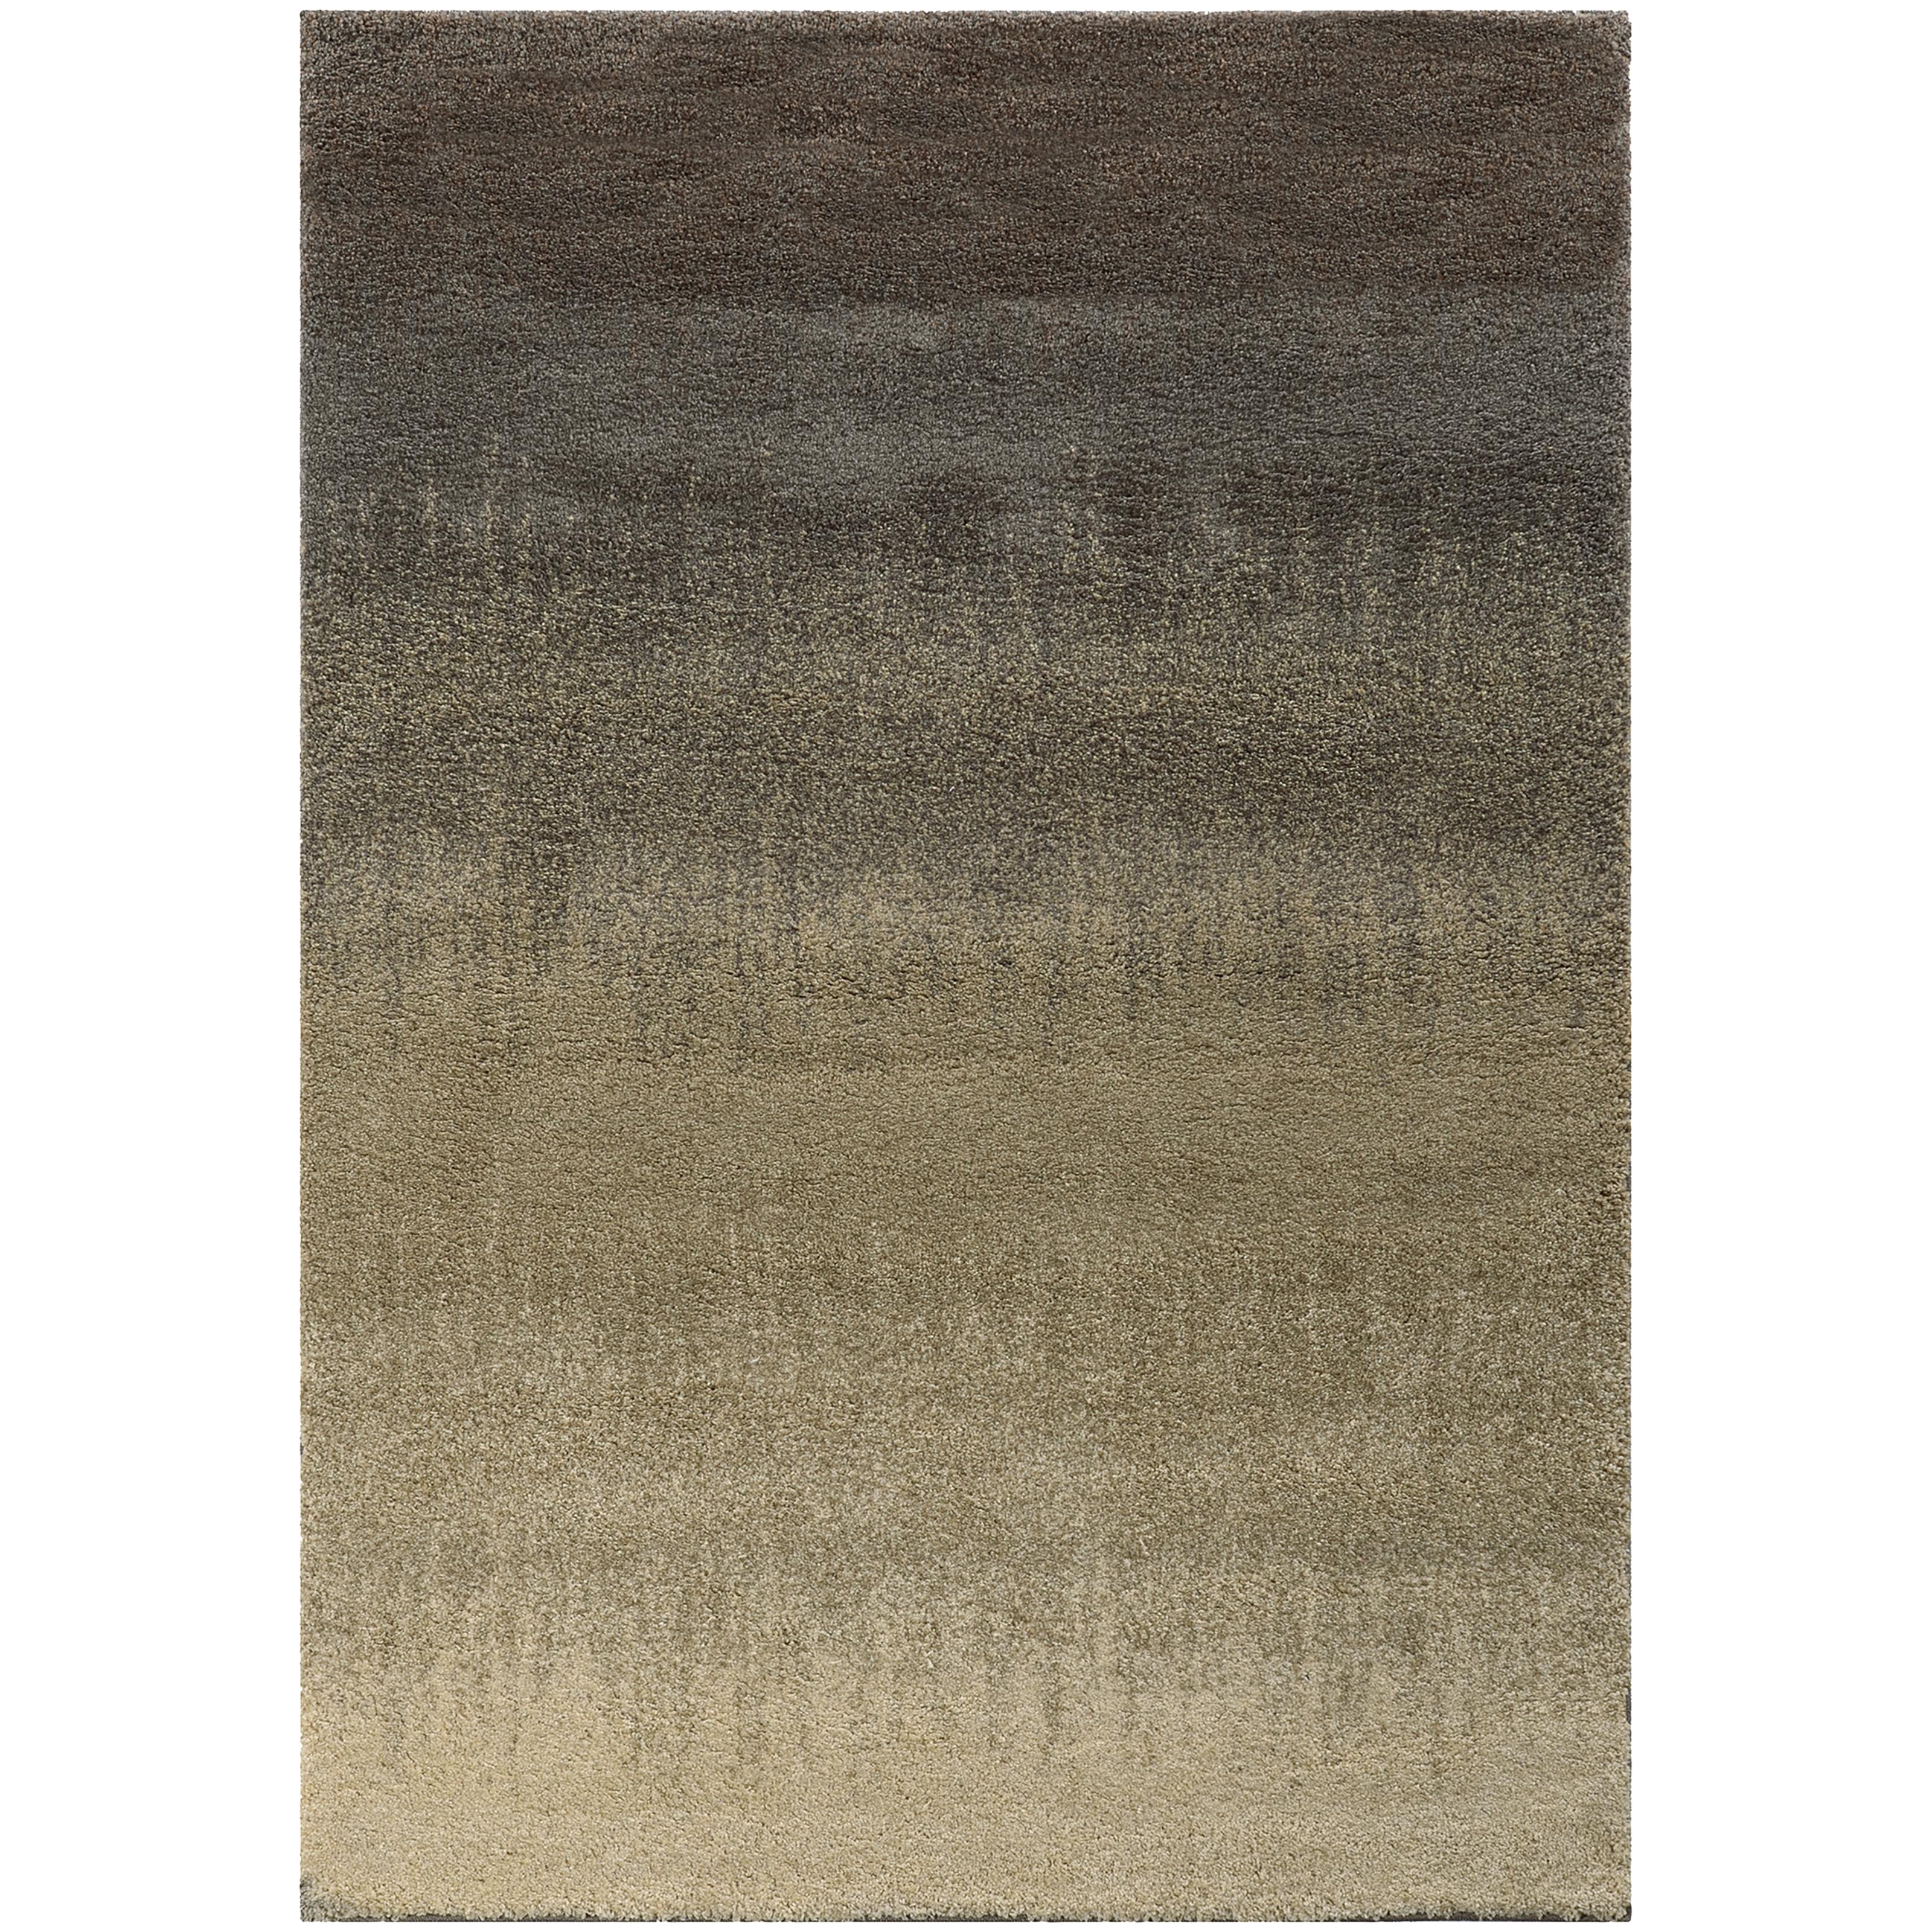 "Oriental Weavers Covington 6' 7"" X  9' 6"" Rug - Item Number: C002J6200290ST"